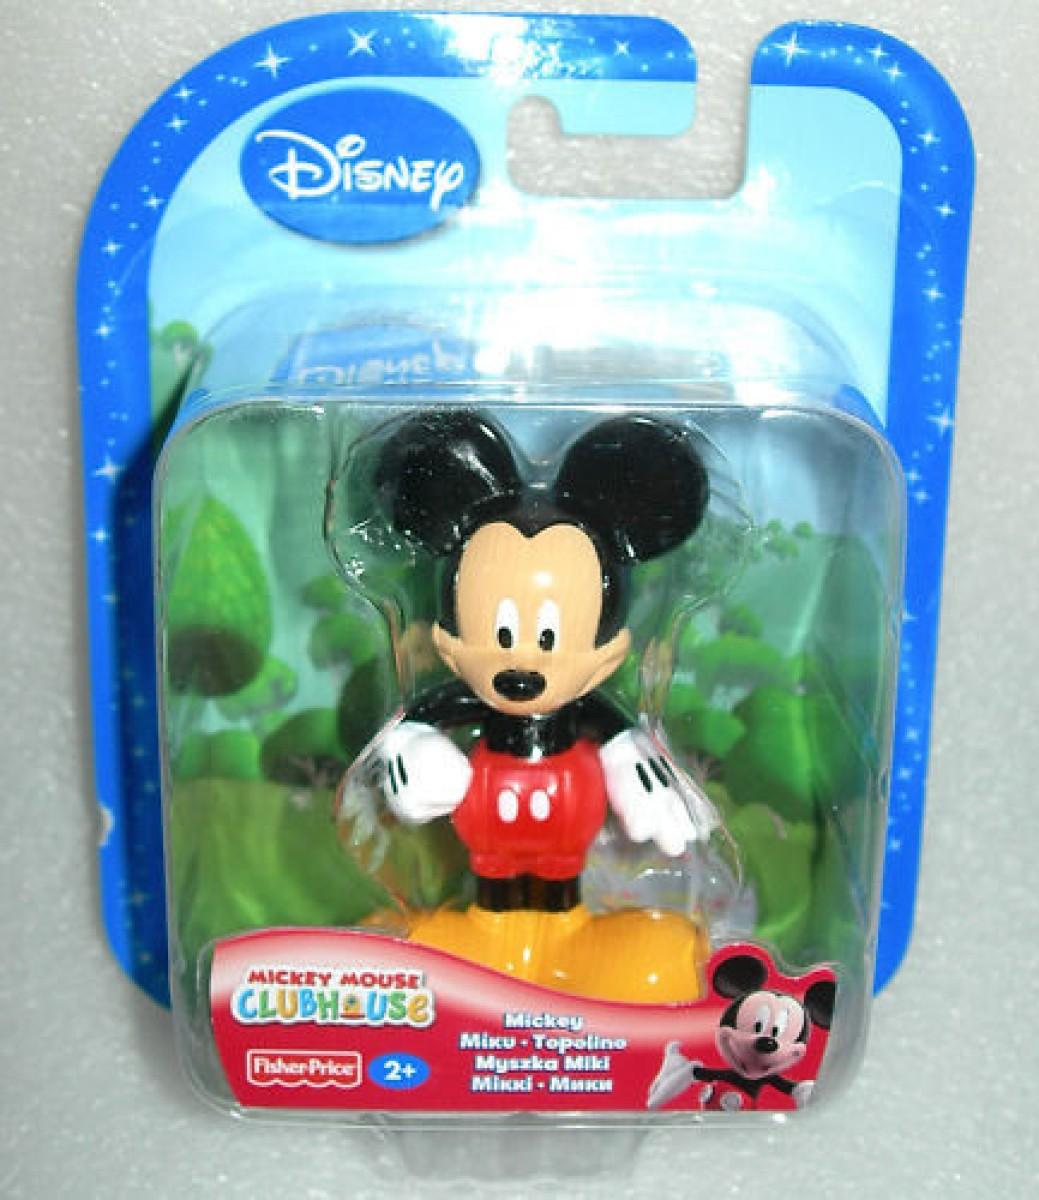 Mickey Mouse Clubhouse Mickey Figure Argosy Toys